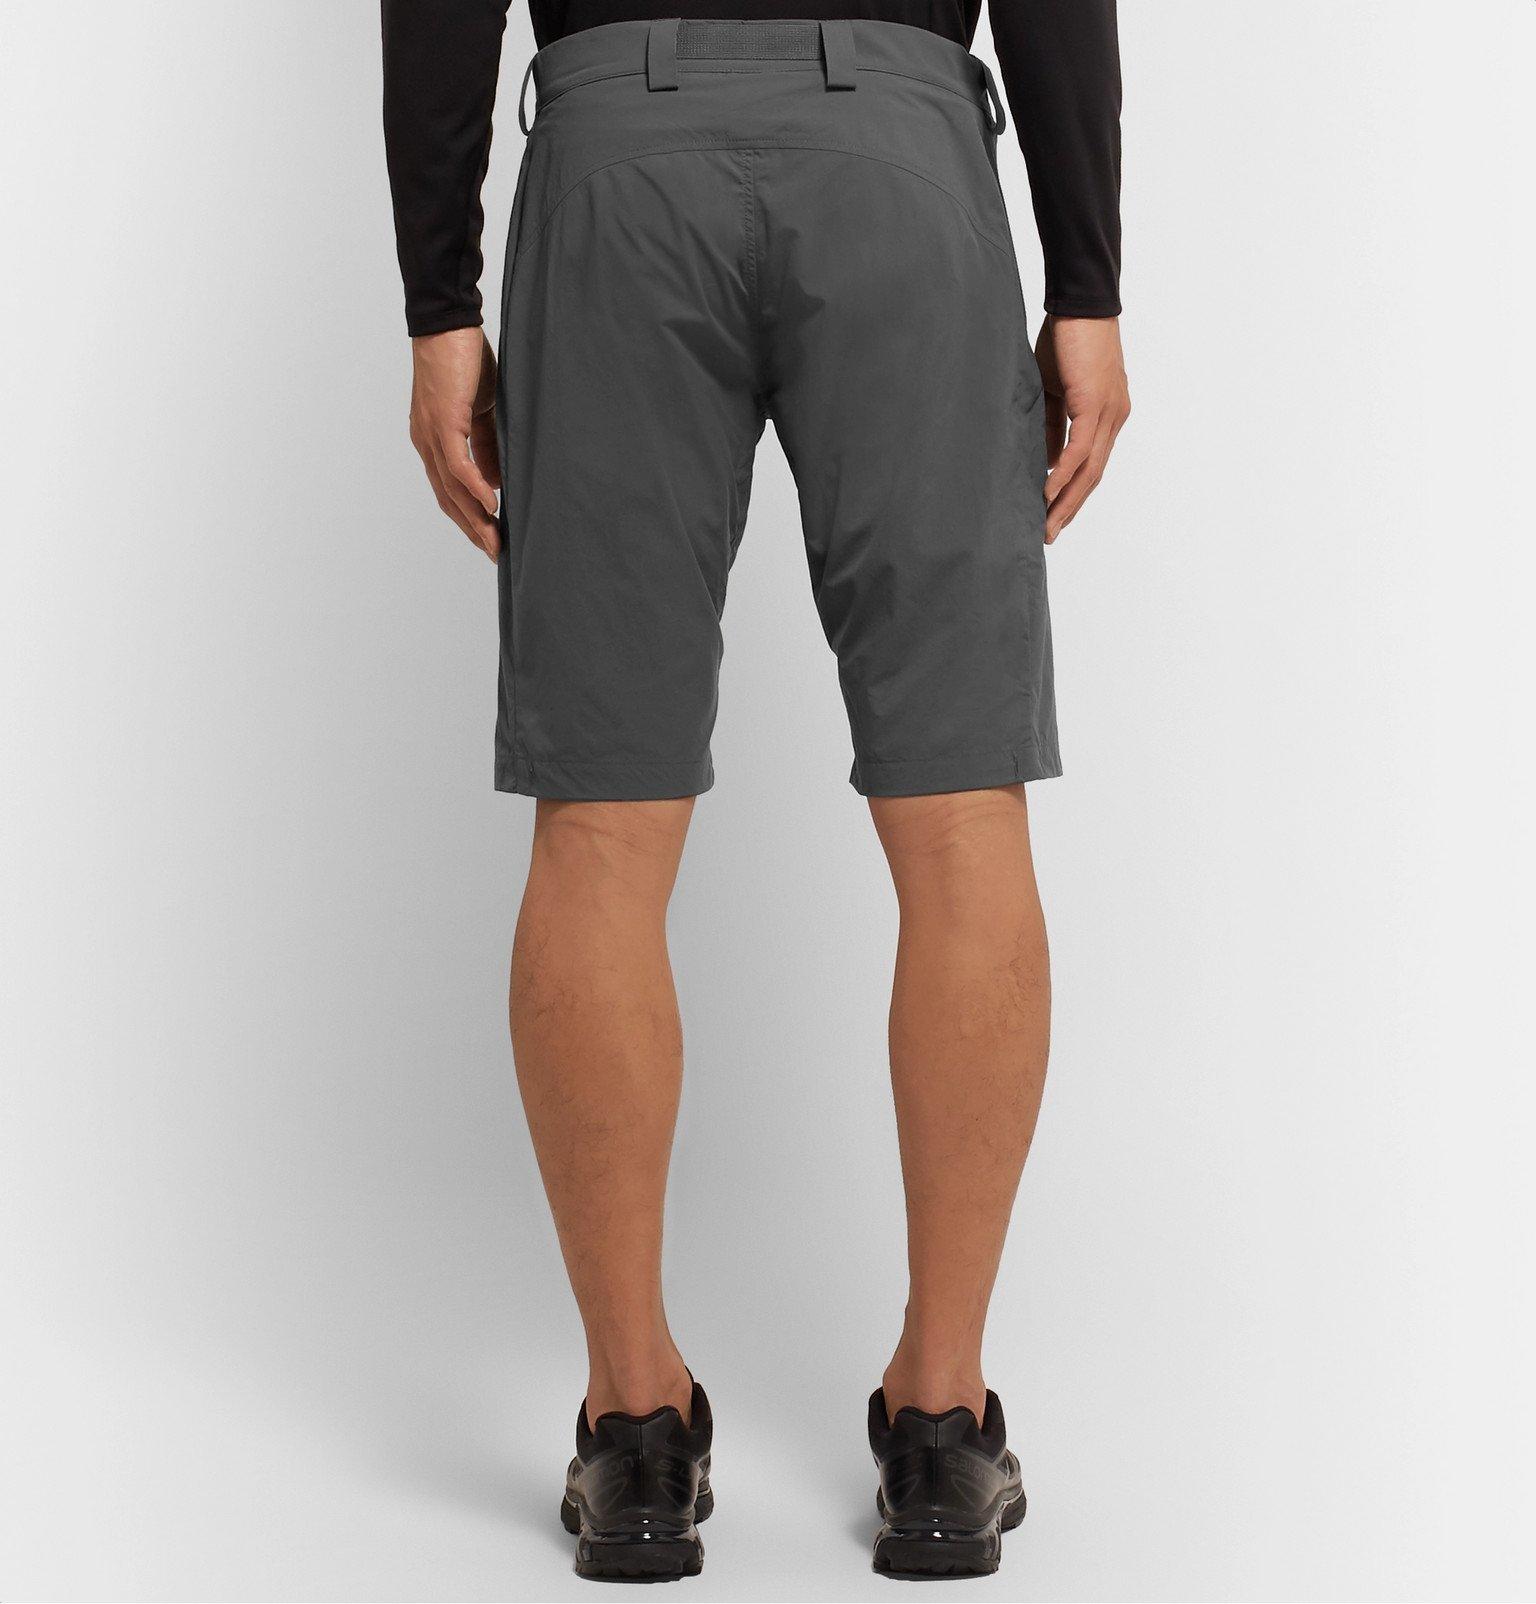 Rab - Calient Belted Matrix Shorts - Gray